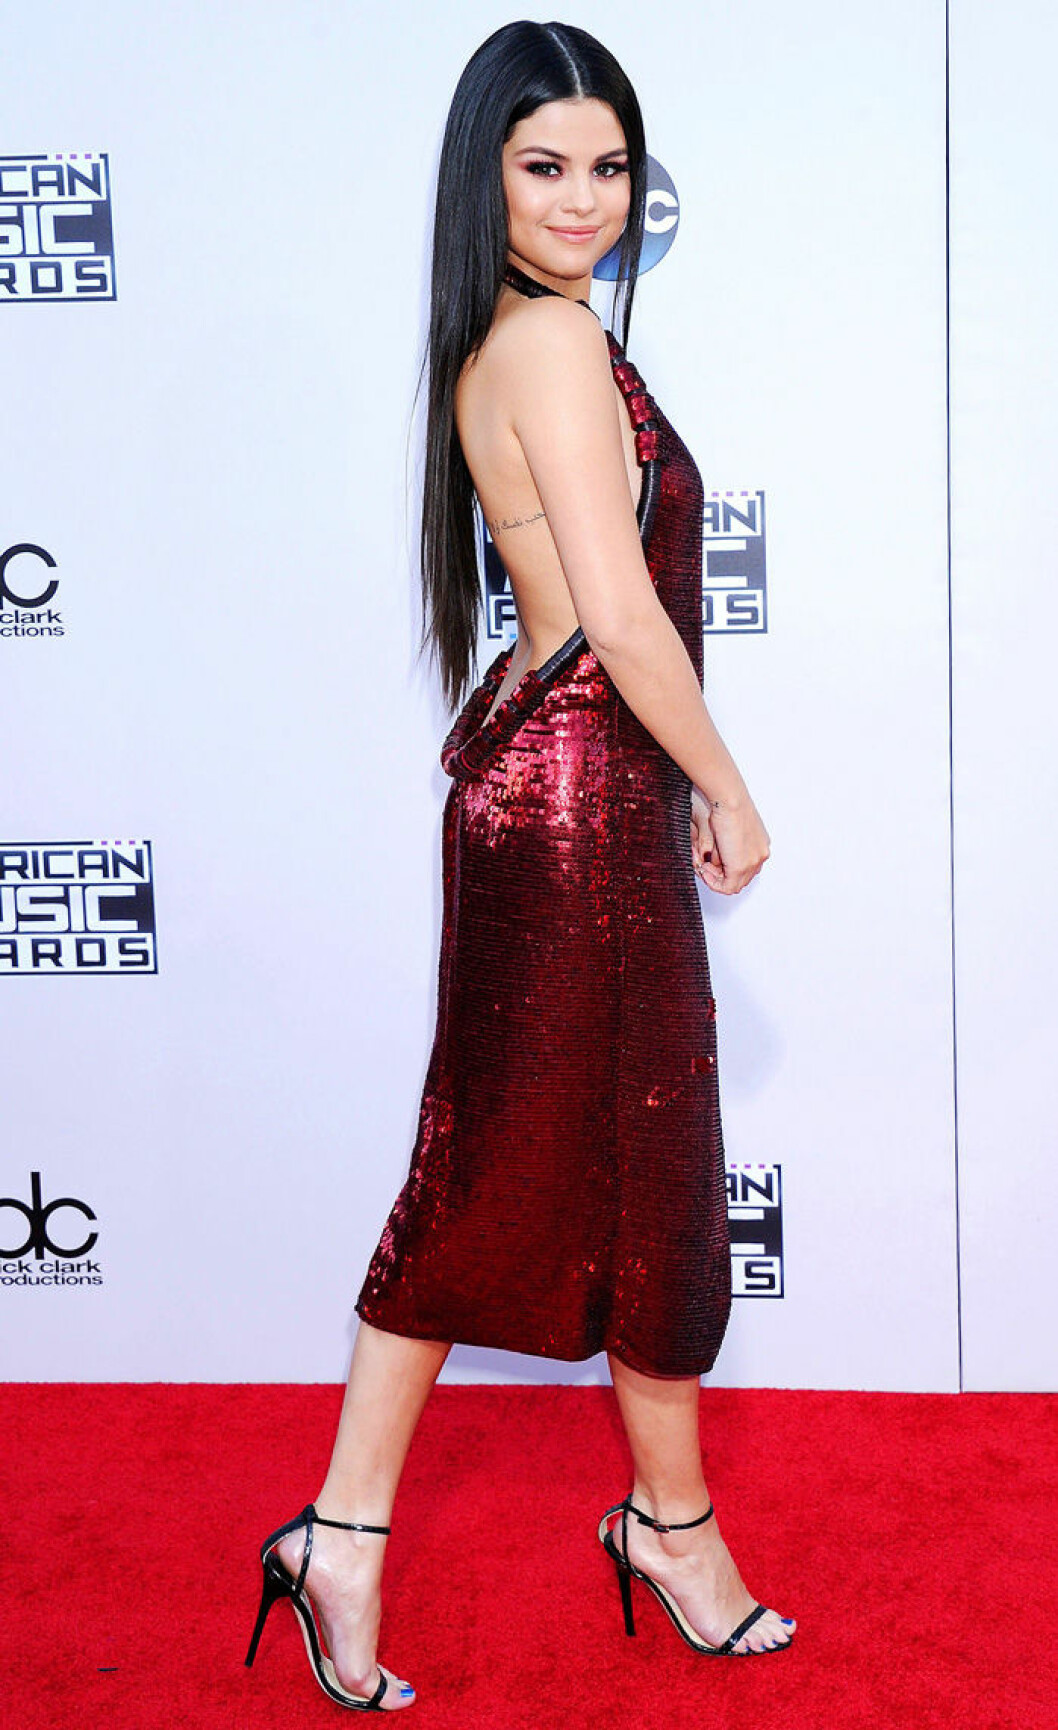 En bild på sångerskan Selena Gomez på American Music Awards 2015.